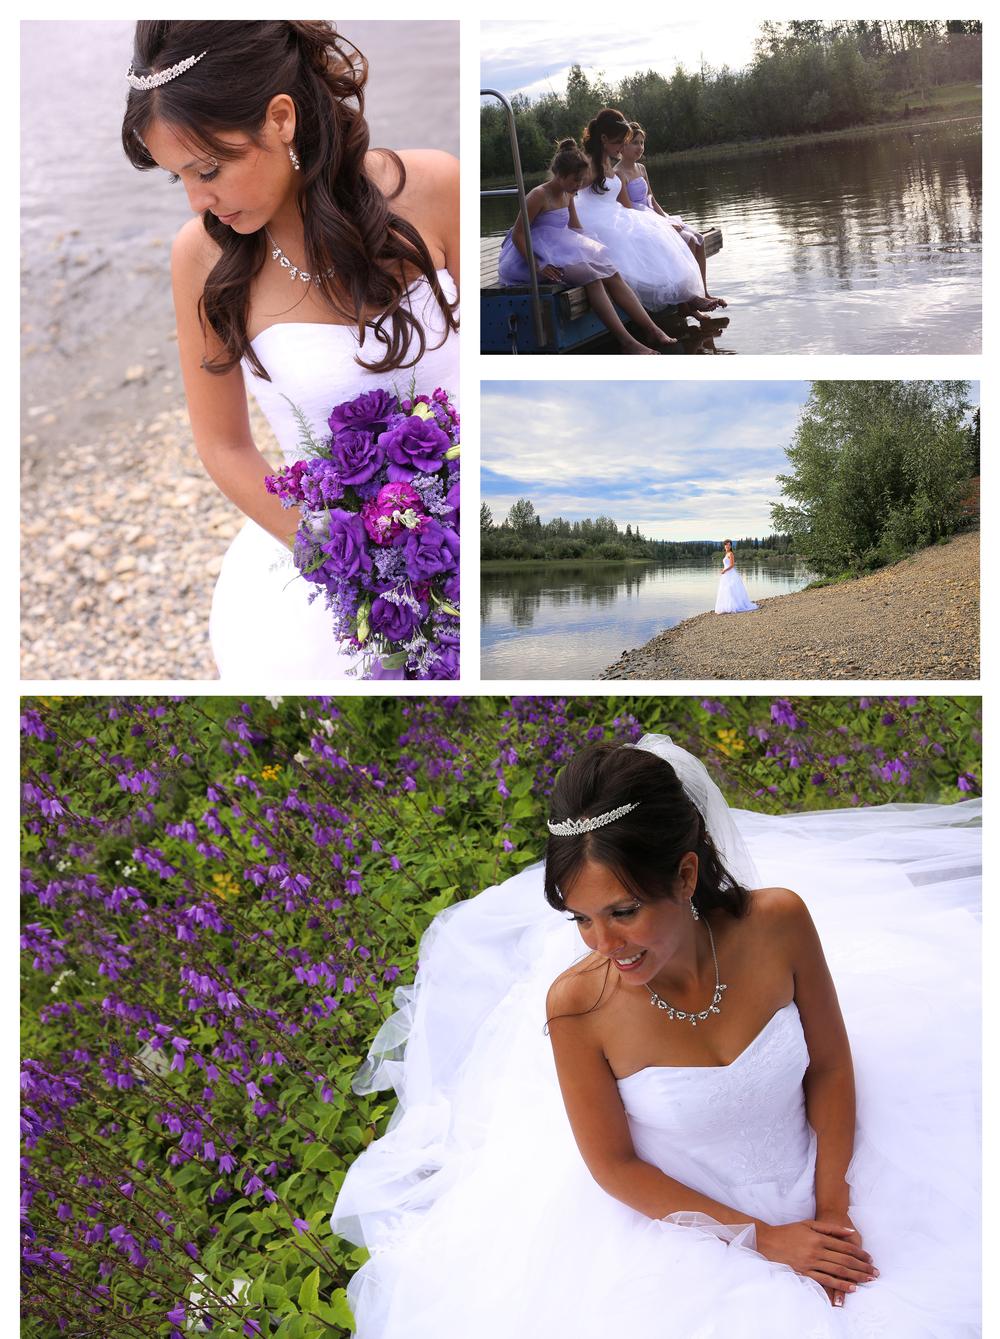 collage_1.jpg